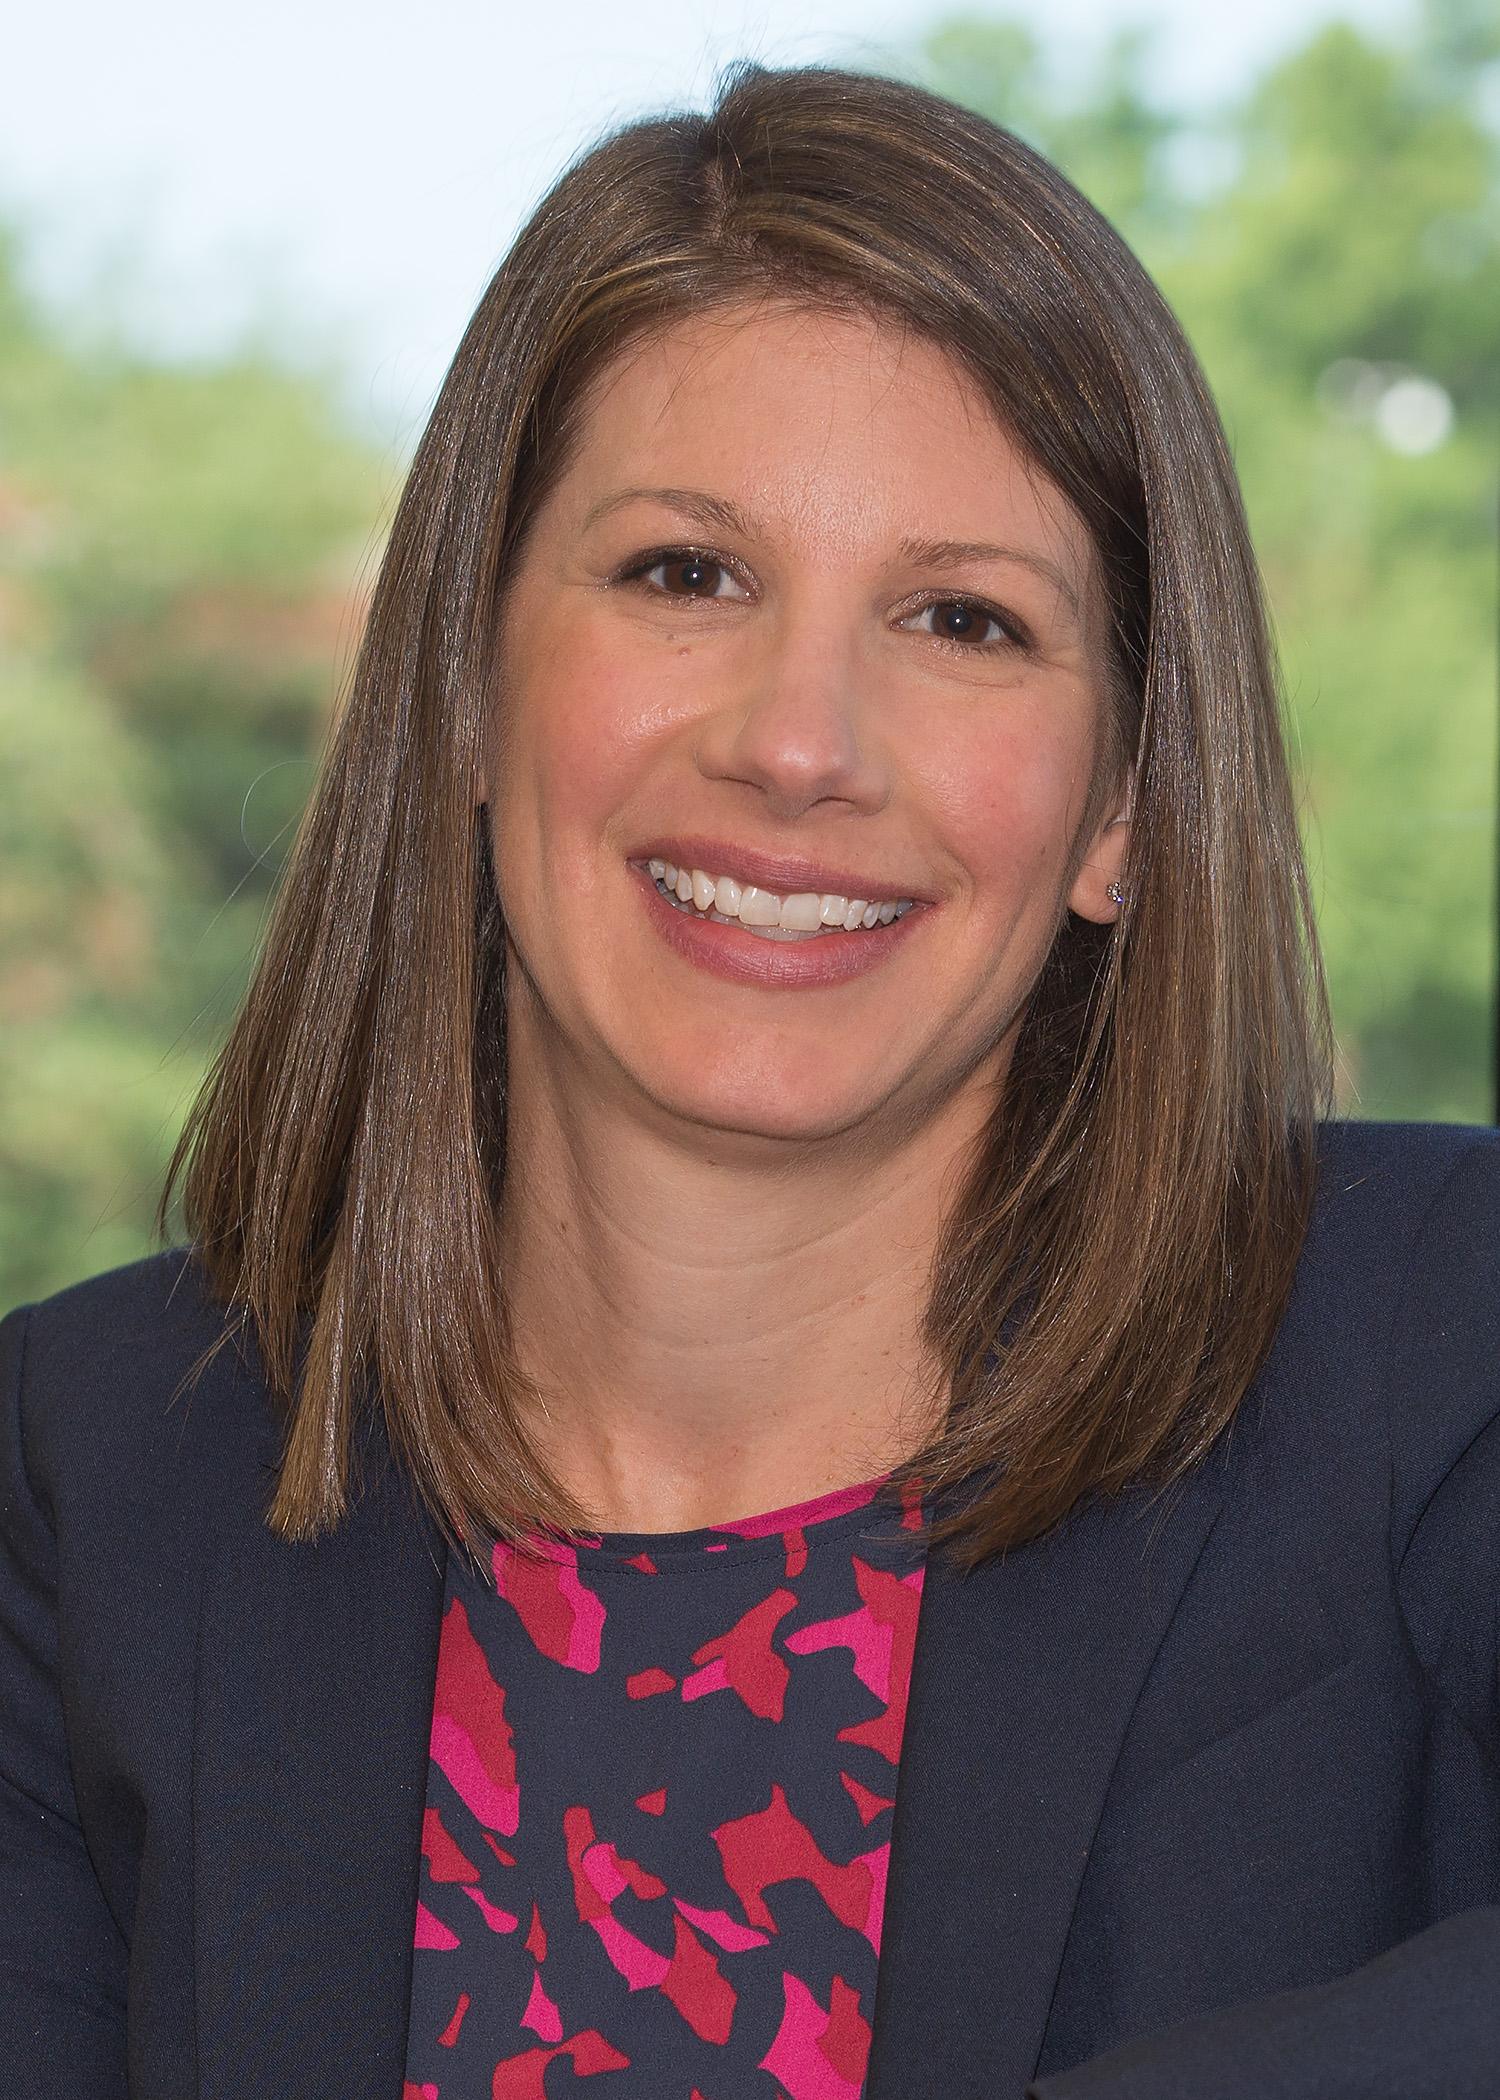 Monica Beyer